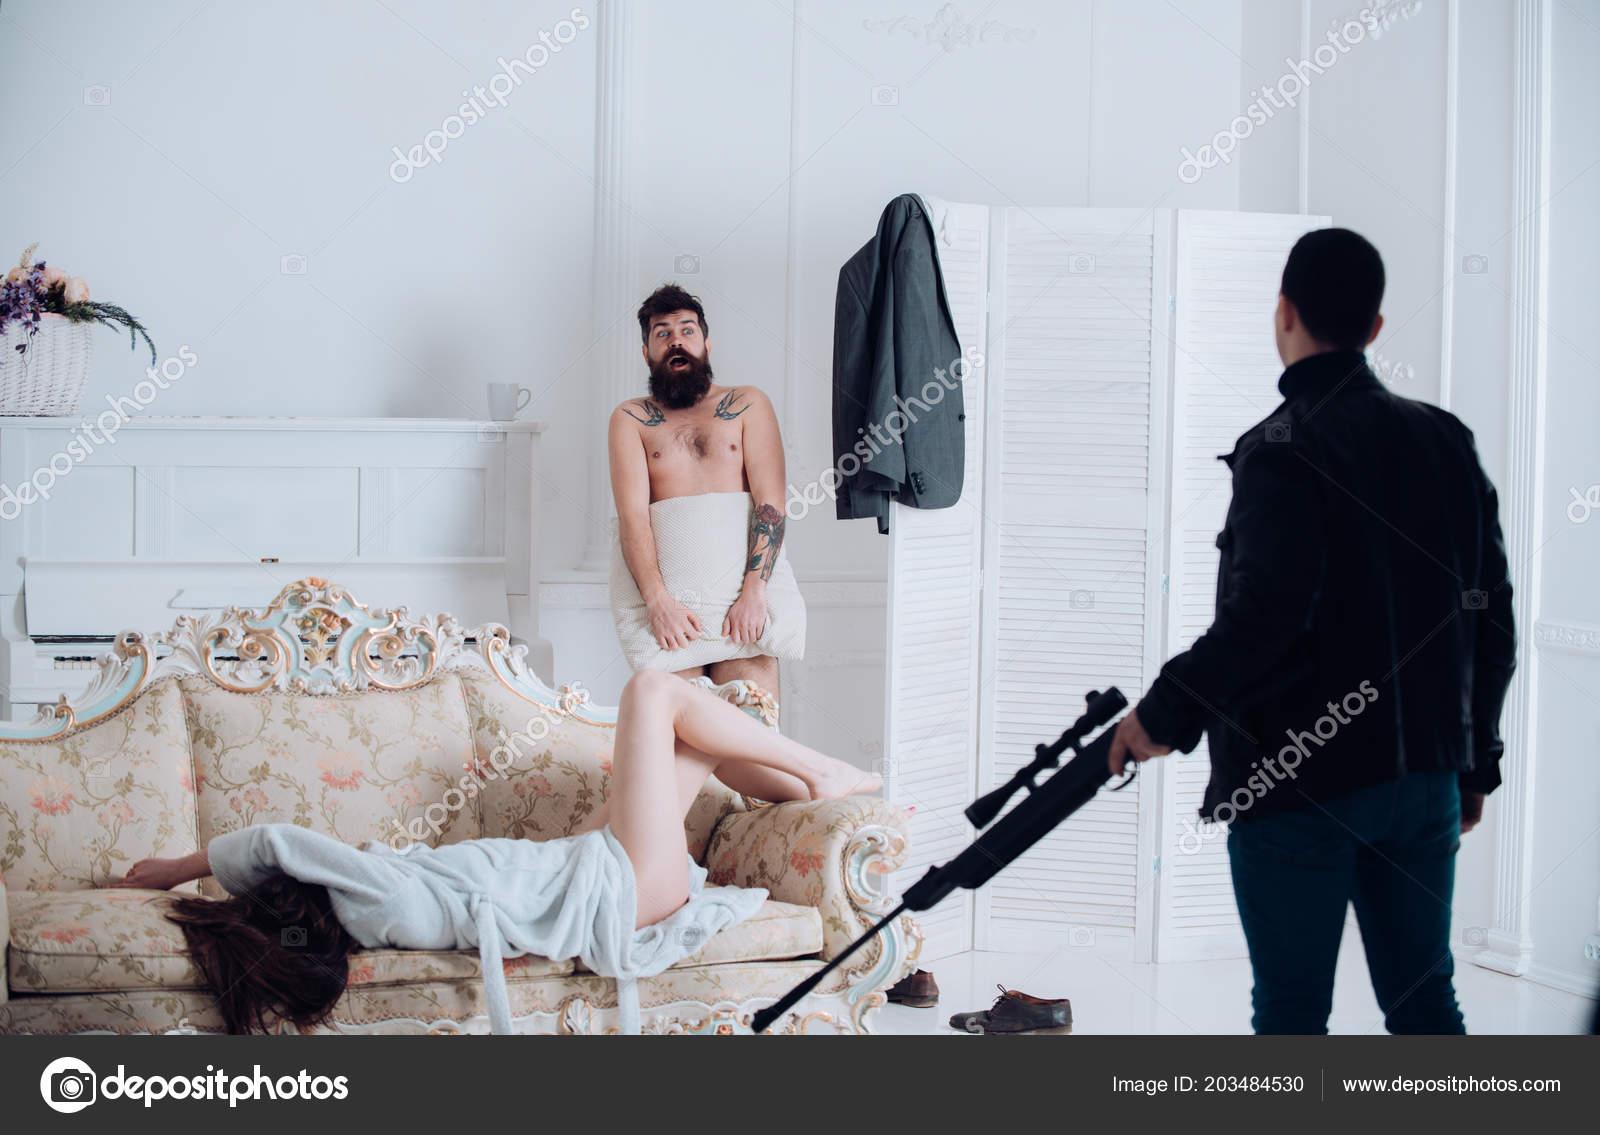 Post my girlfriend nude